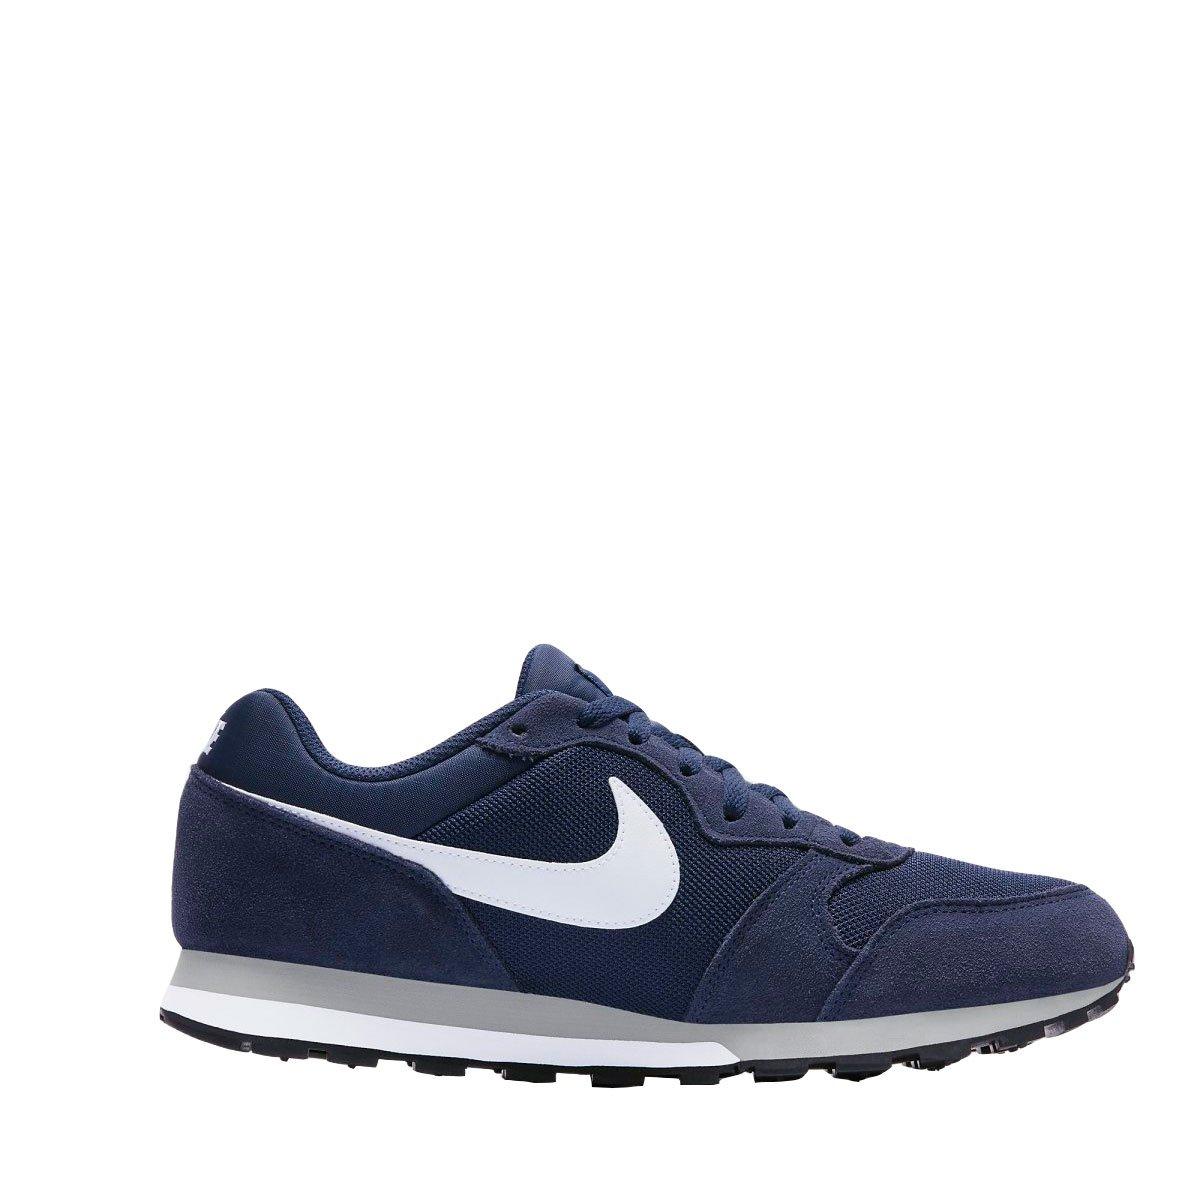 e5f809dc2baea Bizz Store - Tênis Masculino Nike MD Runner 2 Corrida